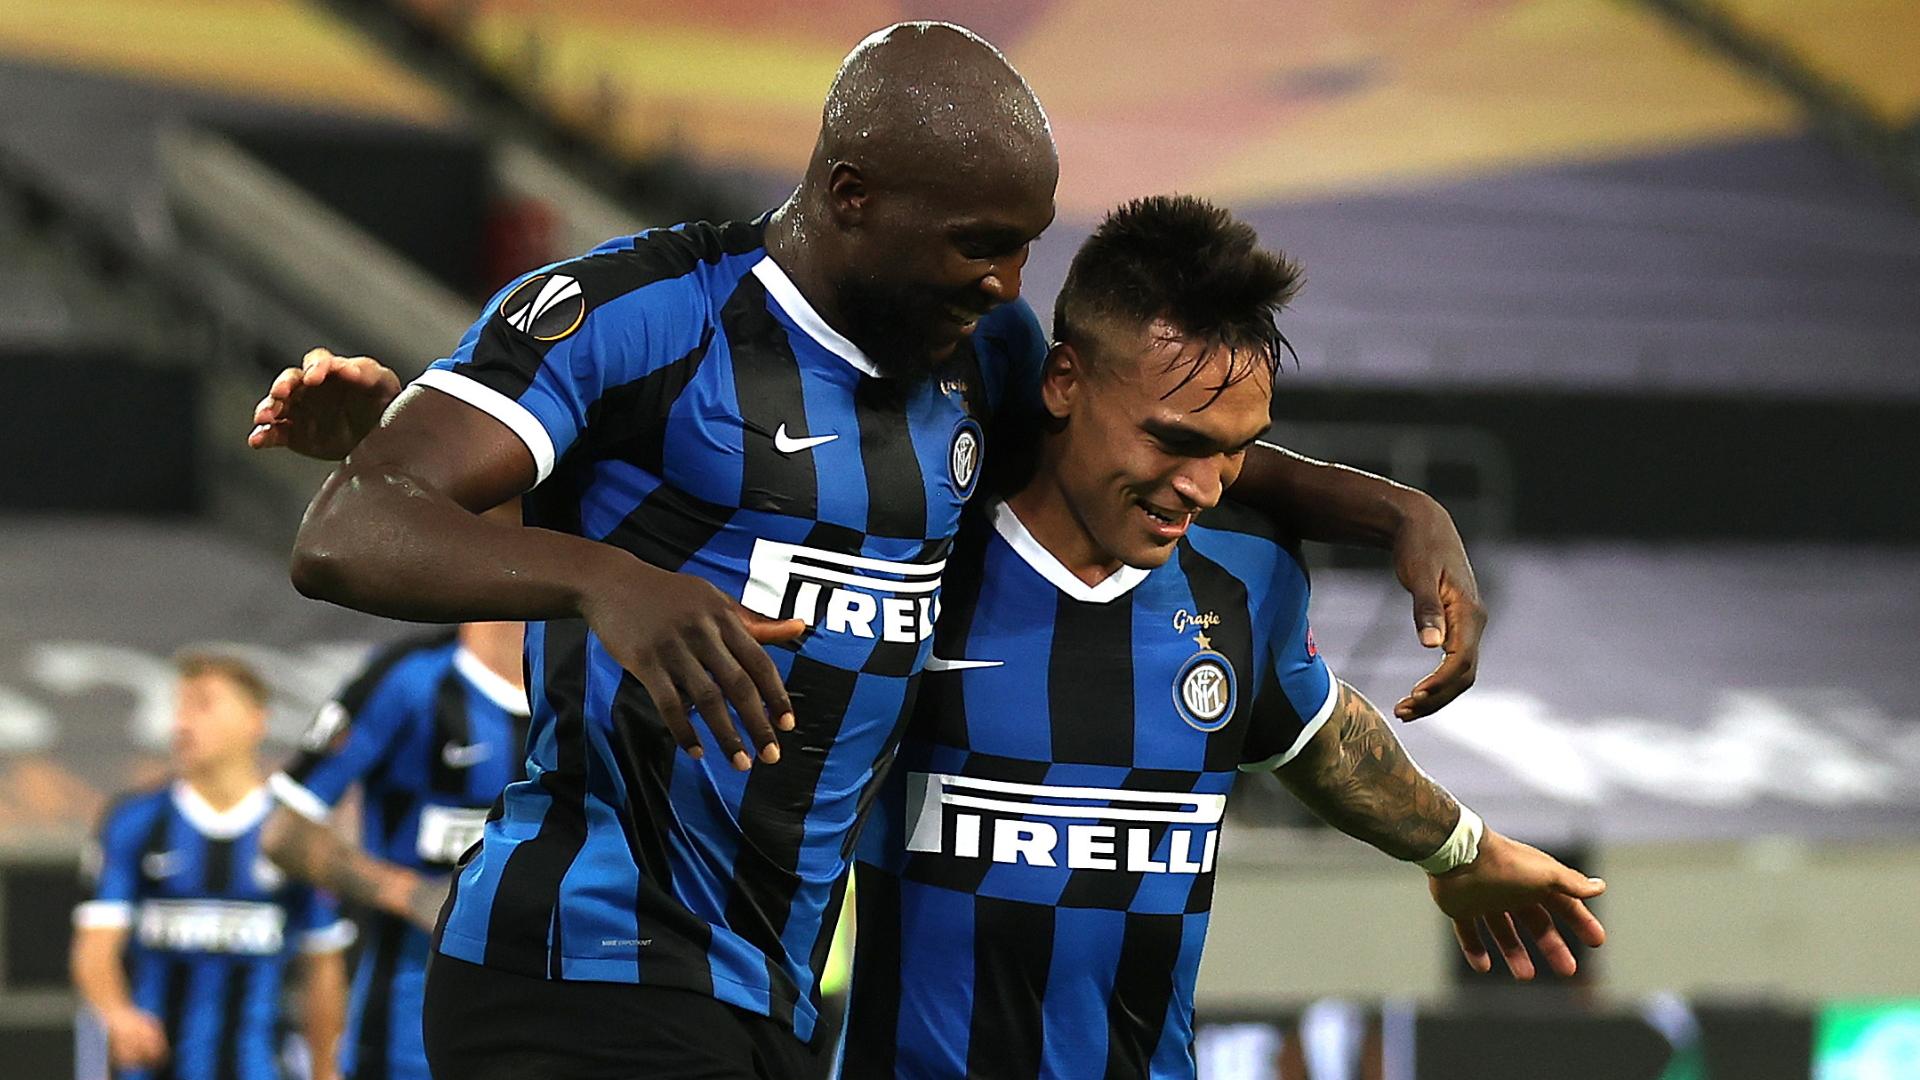 Sevilla beat Inter in thrilling 3-2 struggle to win Europa League